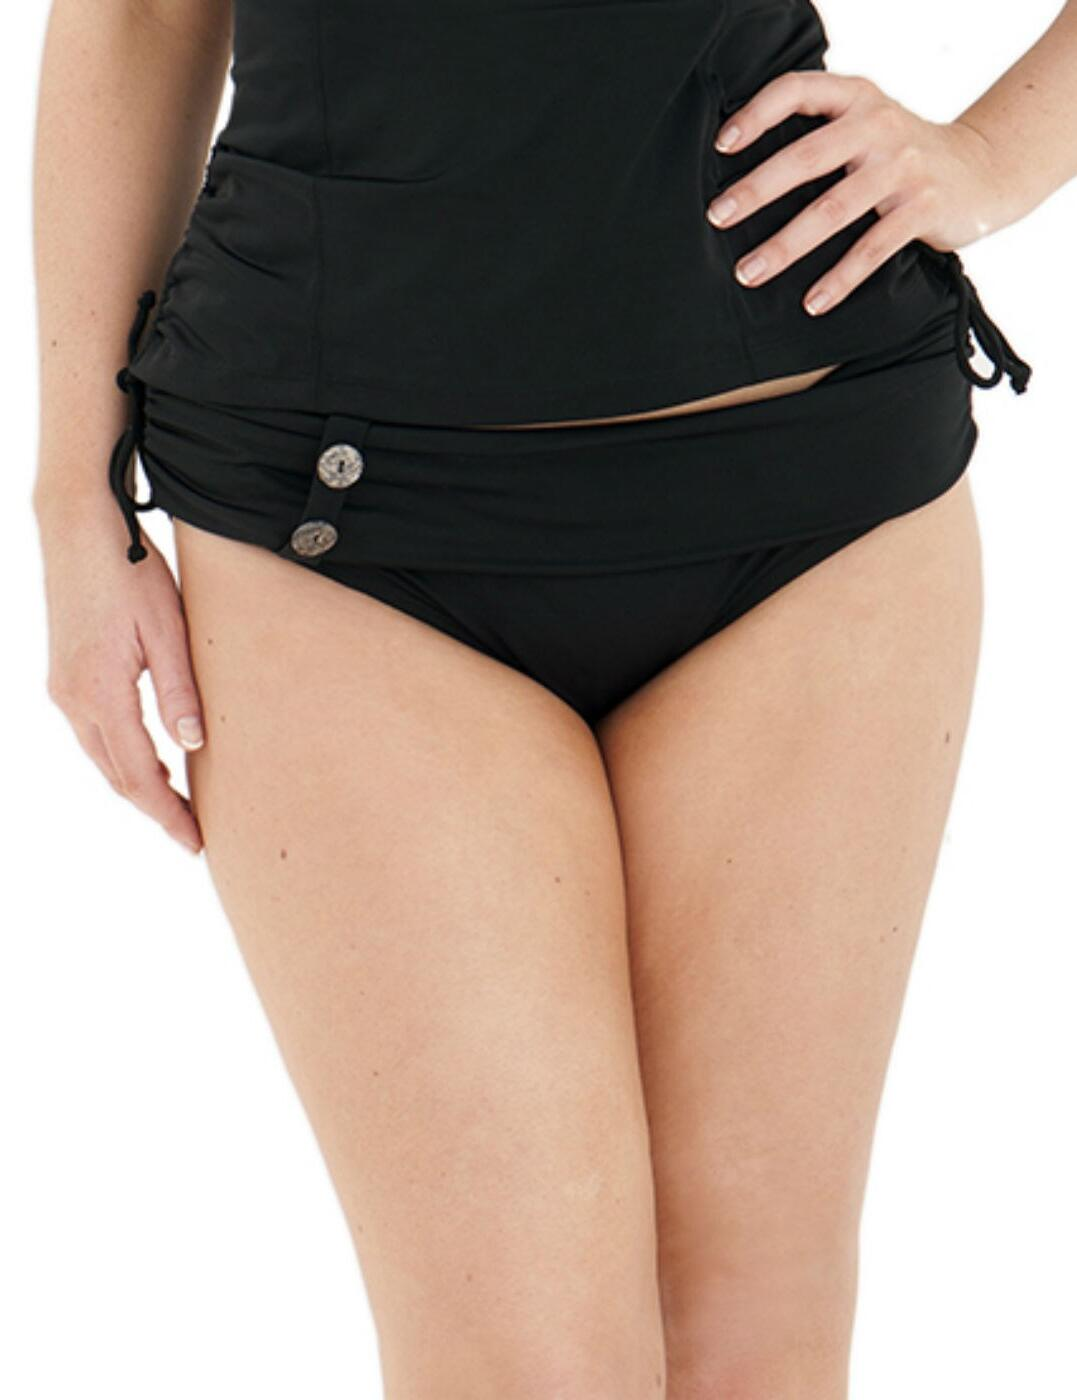 CS1925 Curvy Kate Luau Love Fold Mini Bikini Brief - CS1925 Black